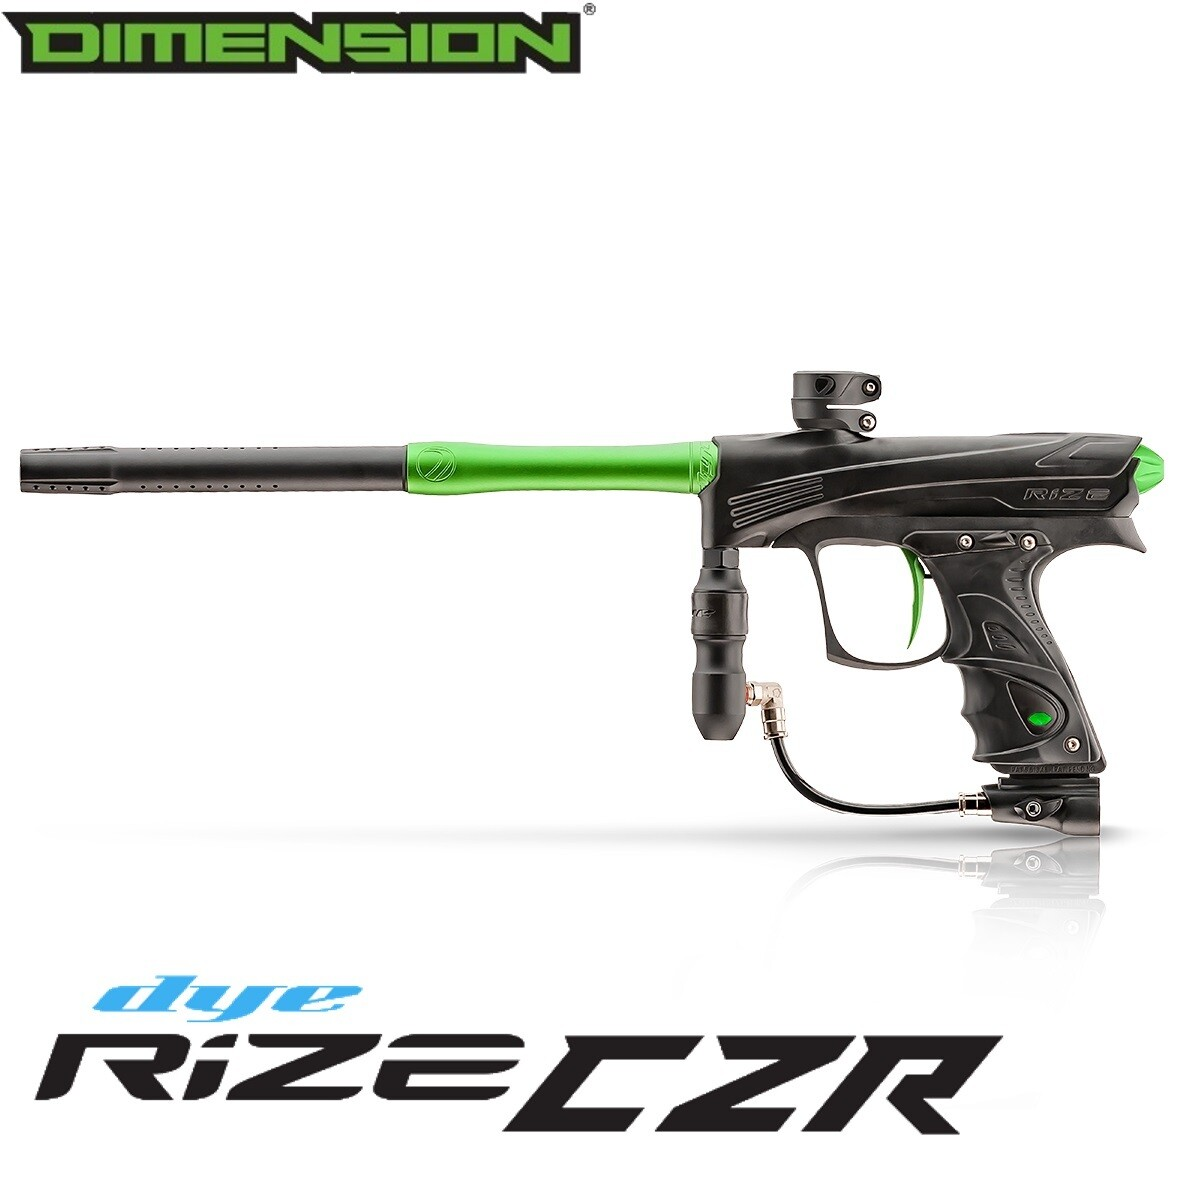 Dye Rize CZR Marker - Black/Lime Dust